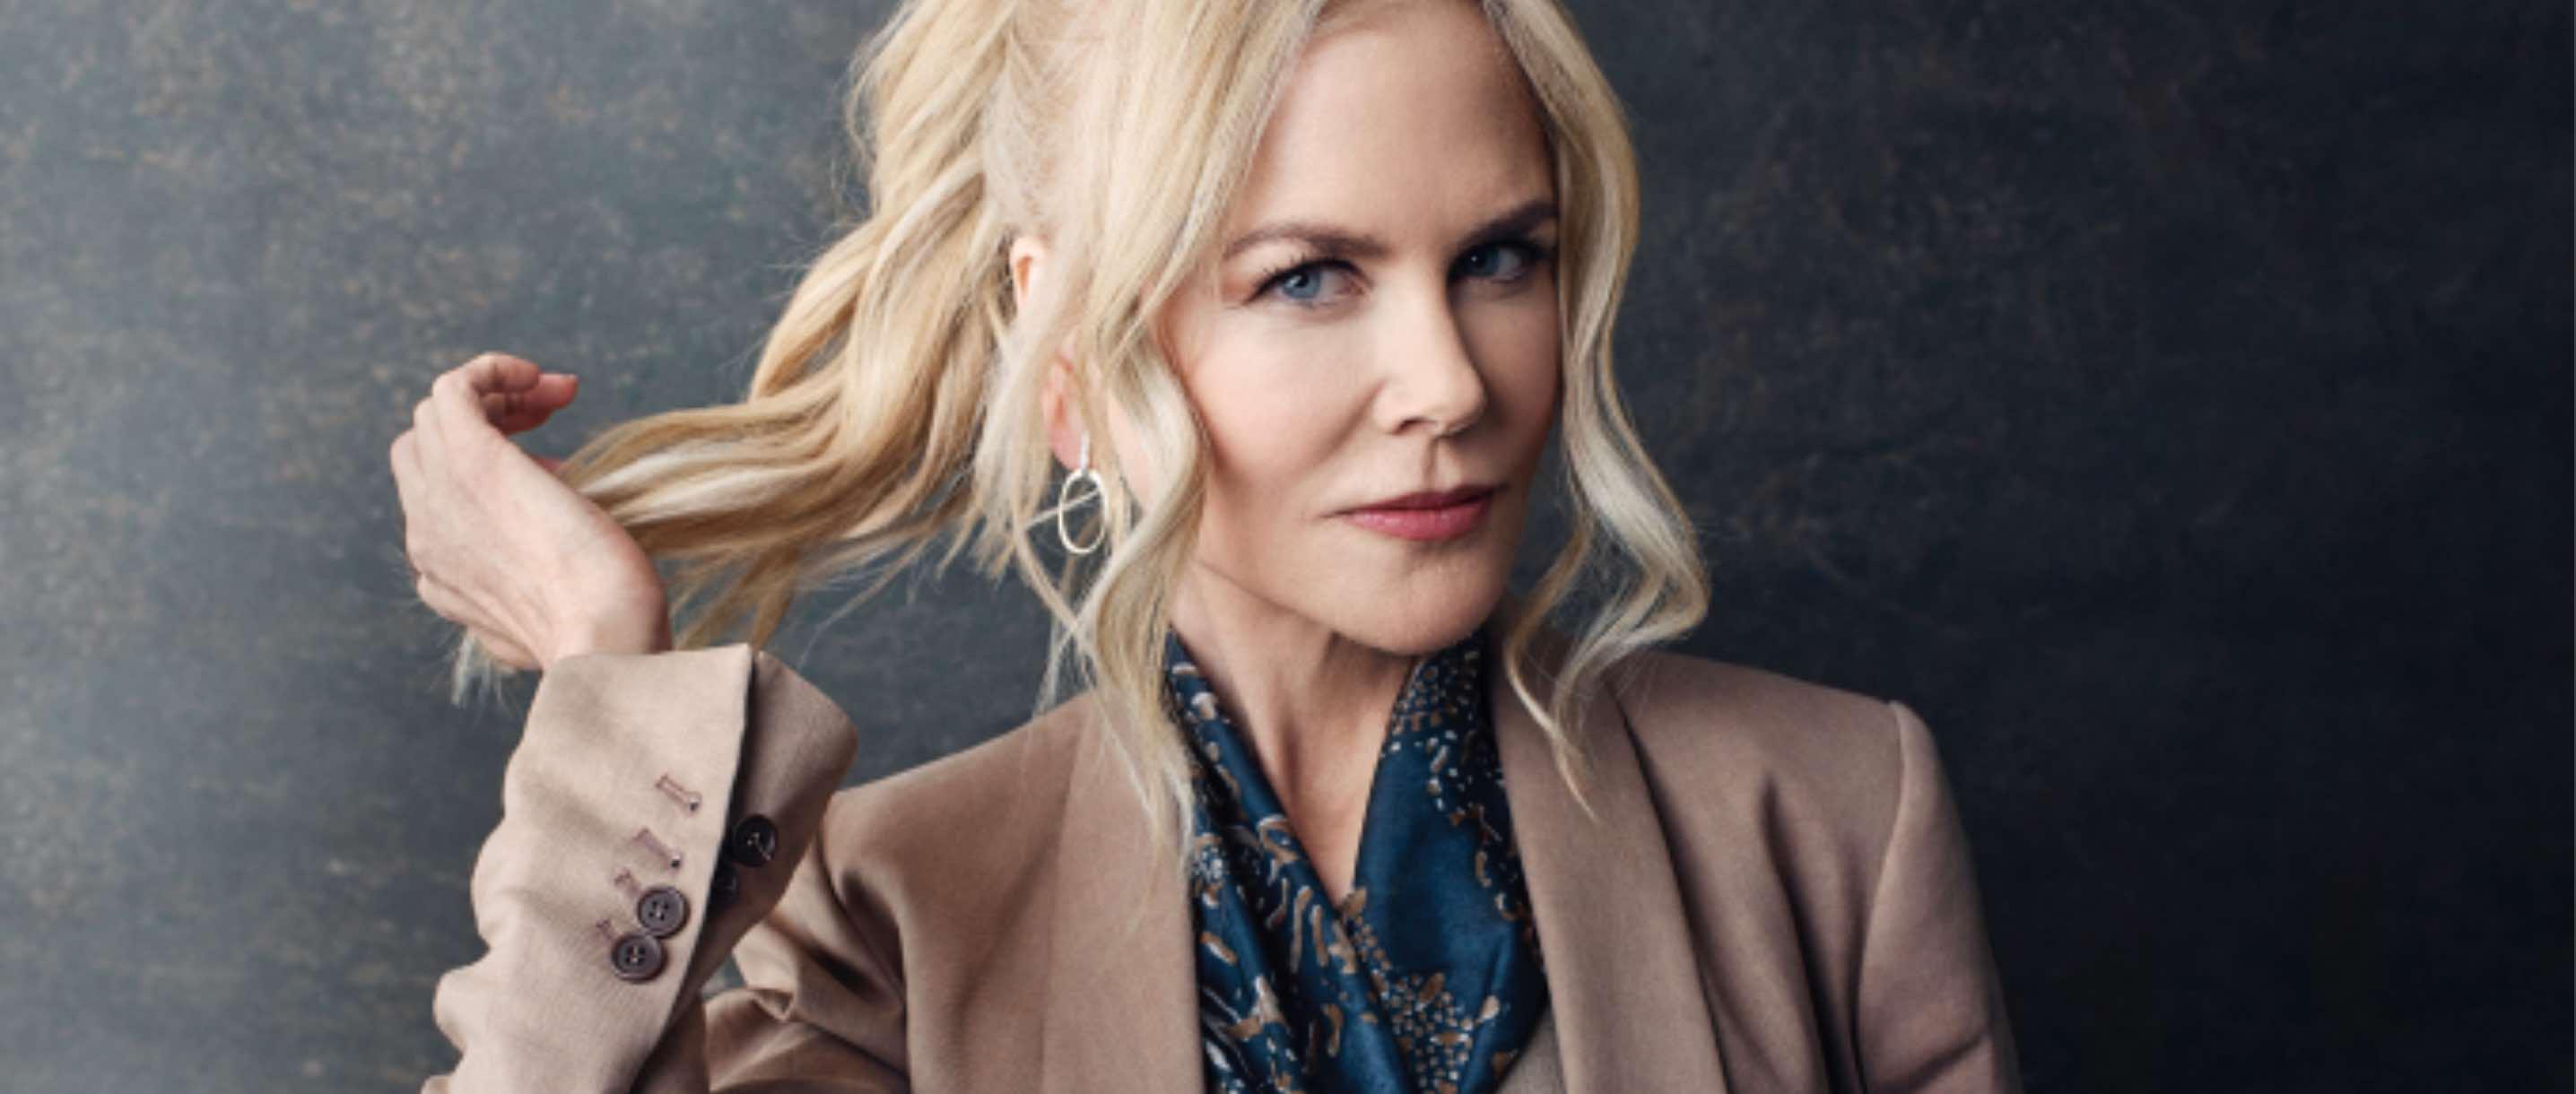 Neutrogena model Nicole Kidman